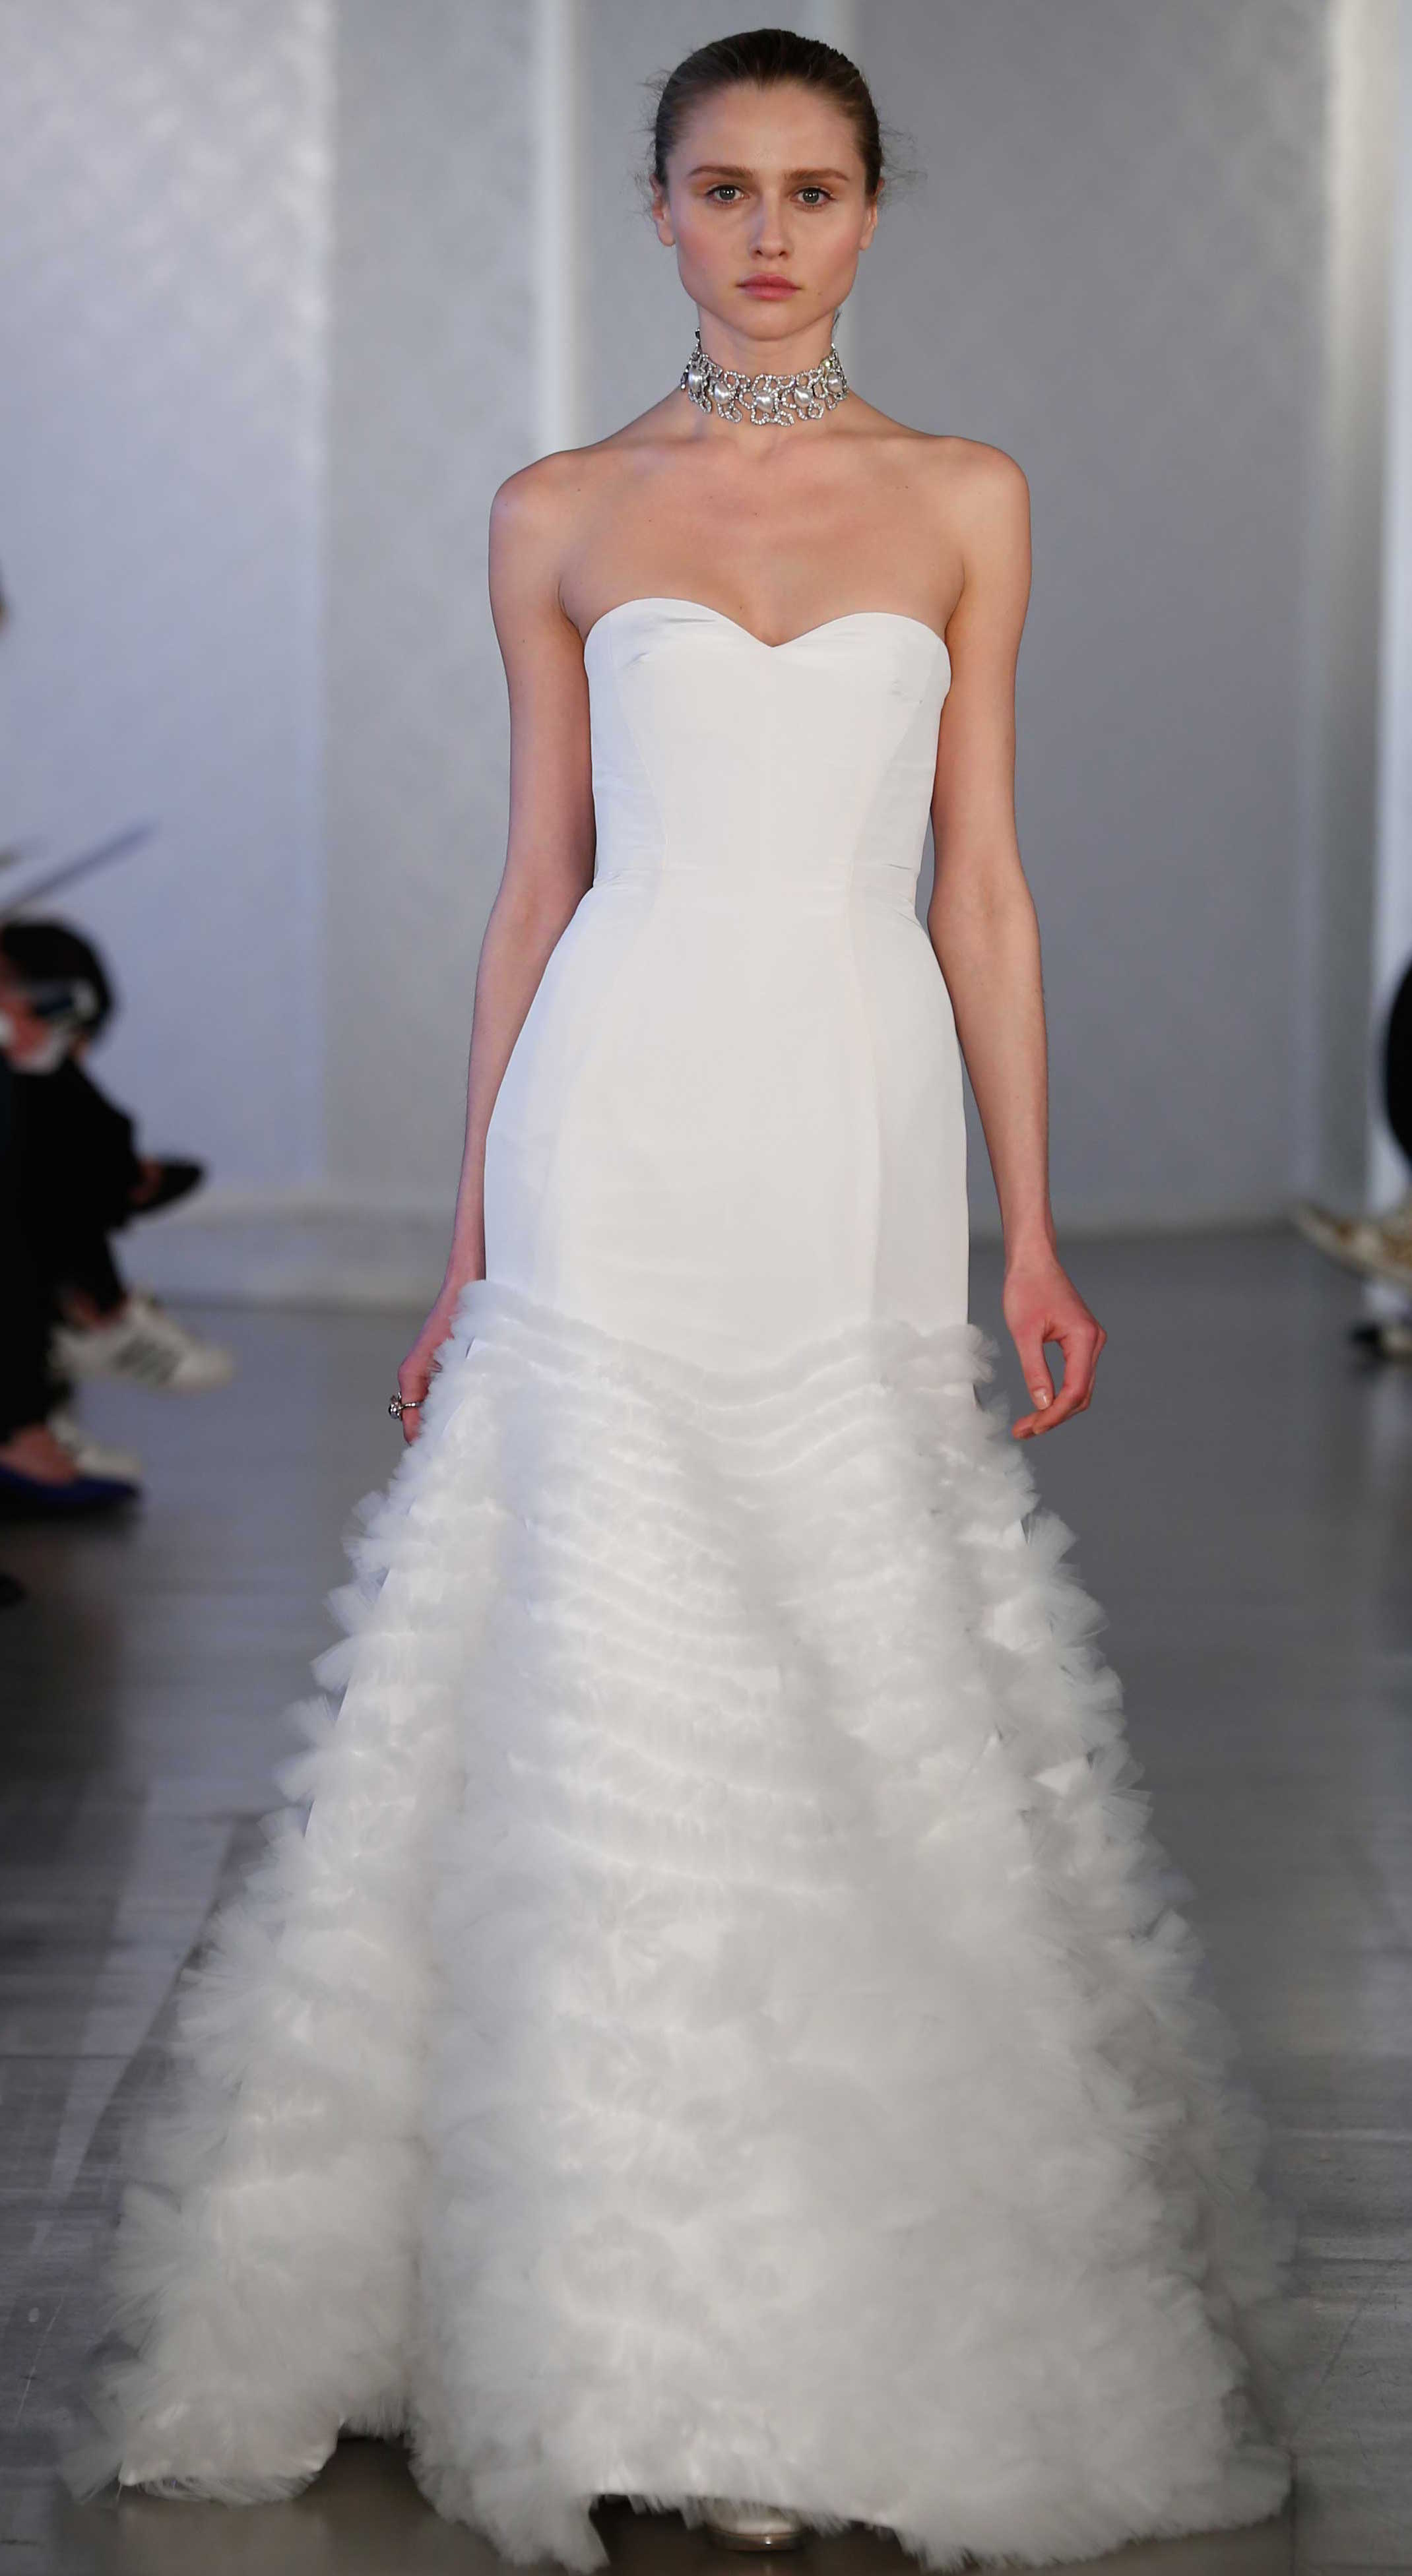 borrow wedding dress Photo courtesy of Oscar de la Renta